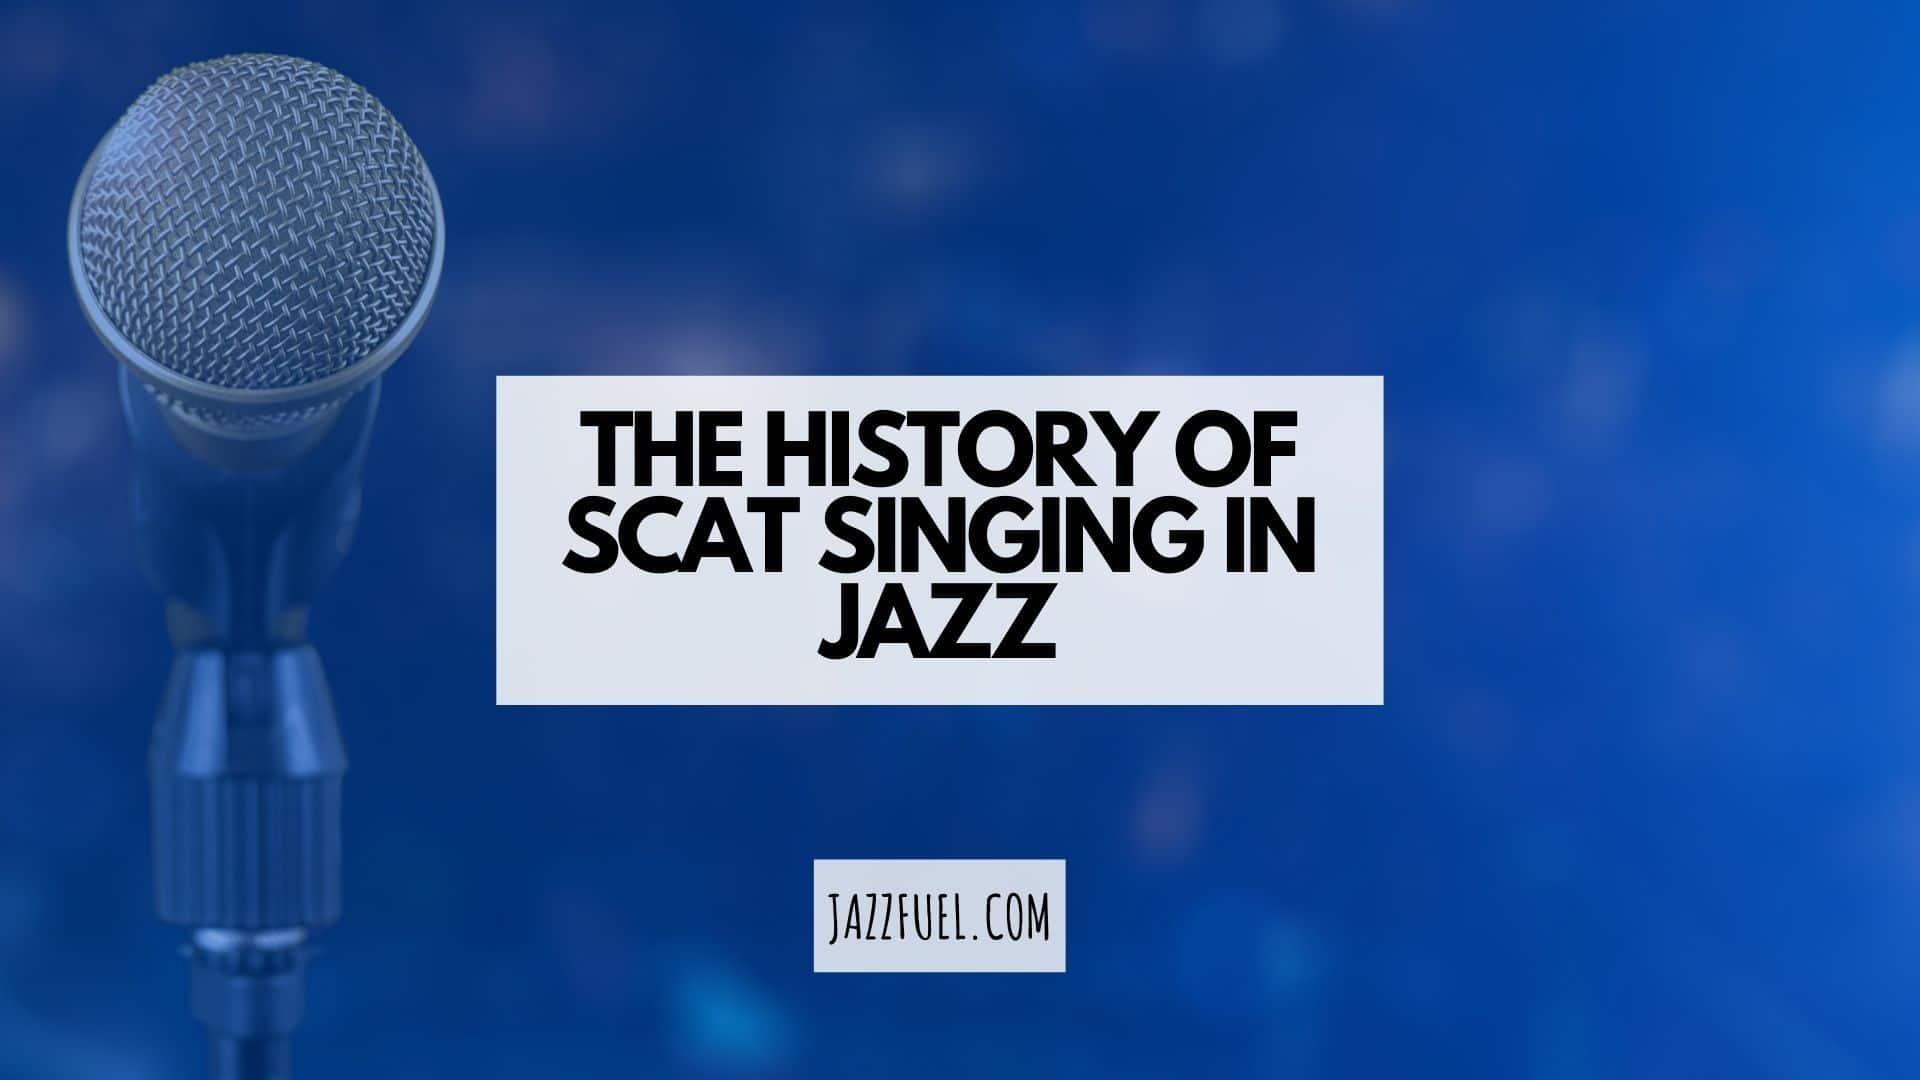 Jazz Scat singing